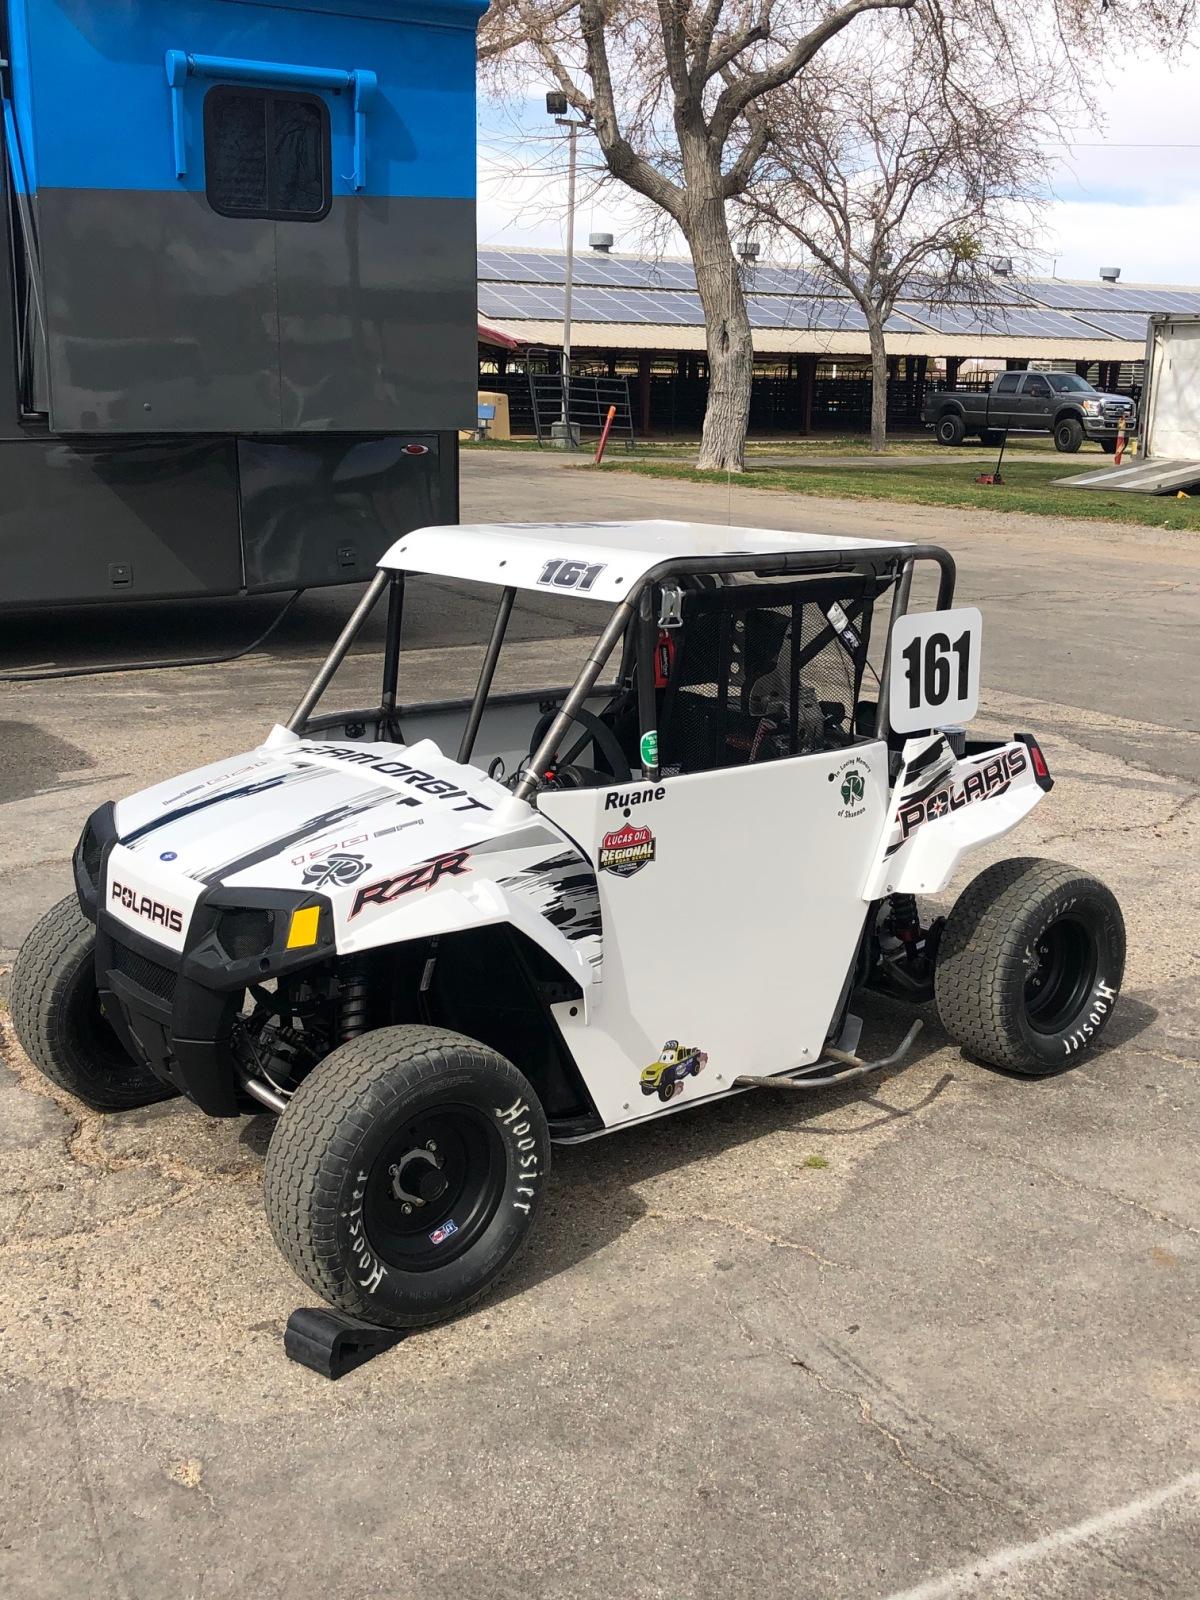 For Sale: 2020 Polaris Rzr 170 Race Ready - photo0